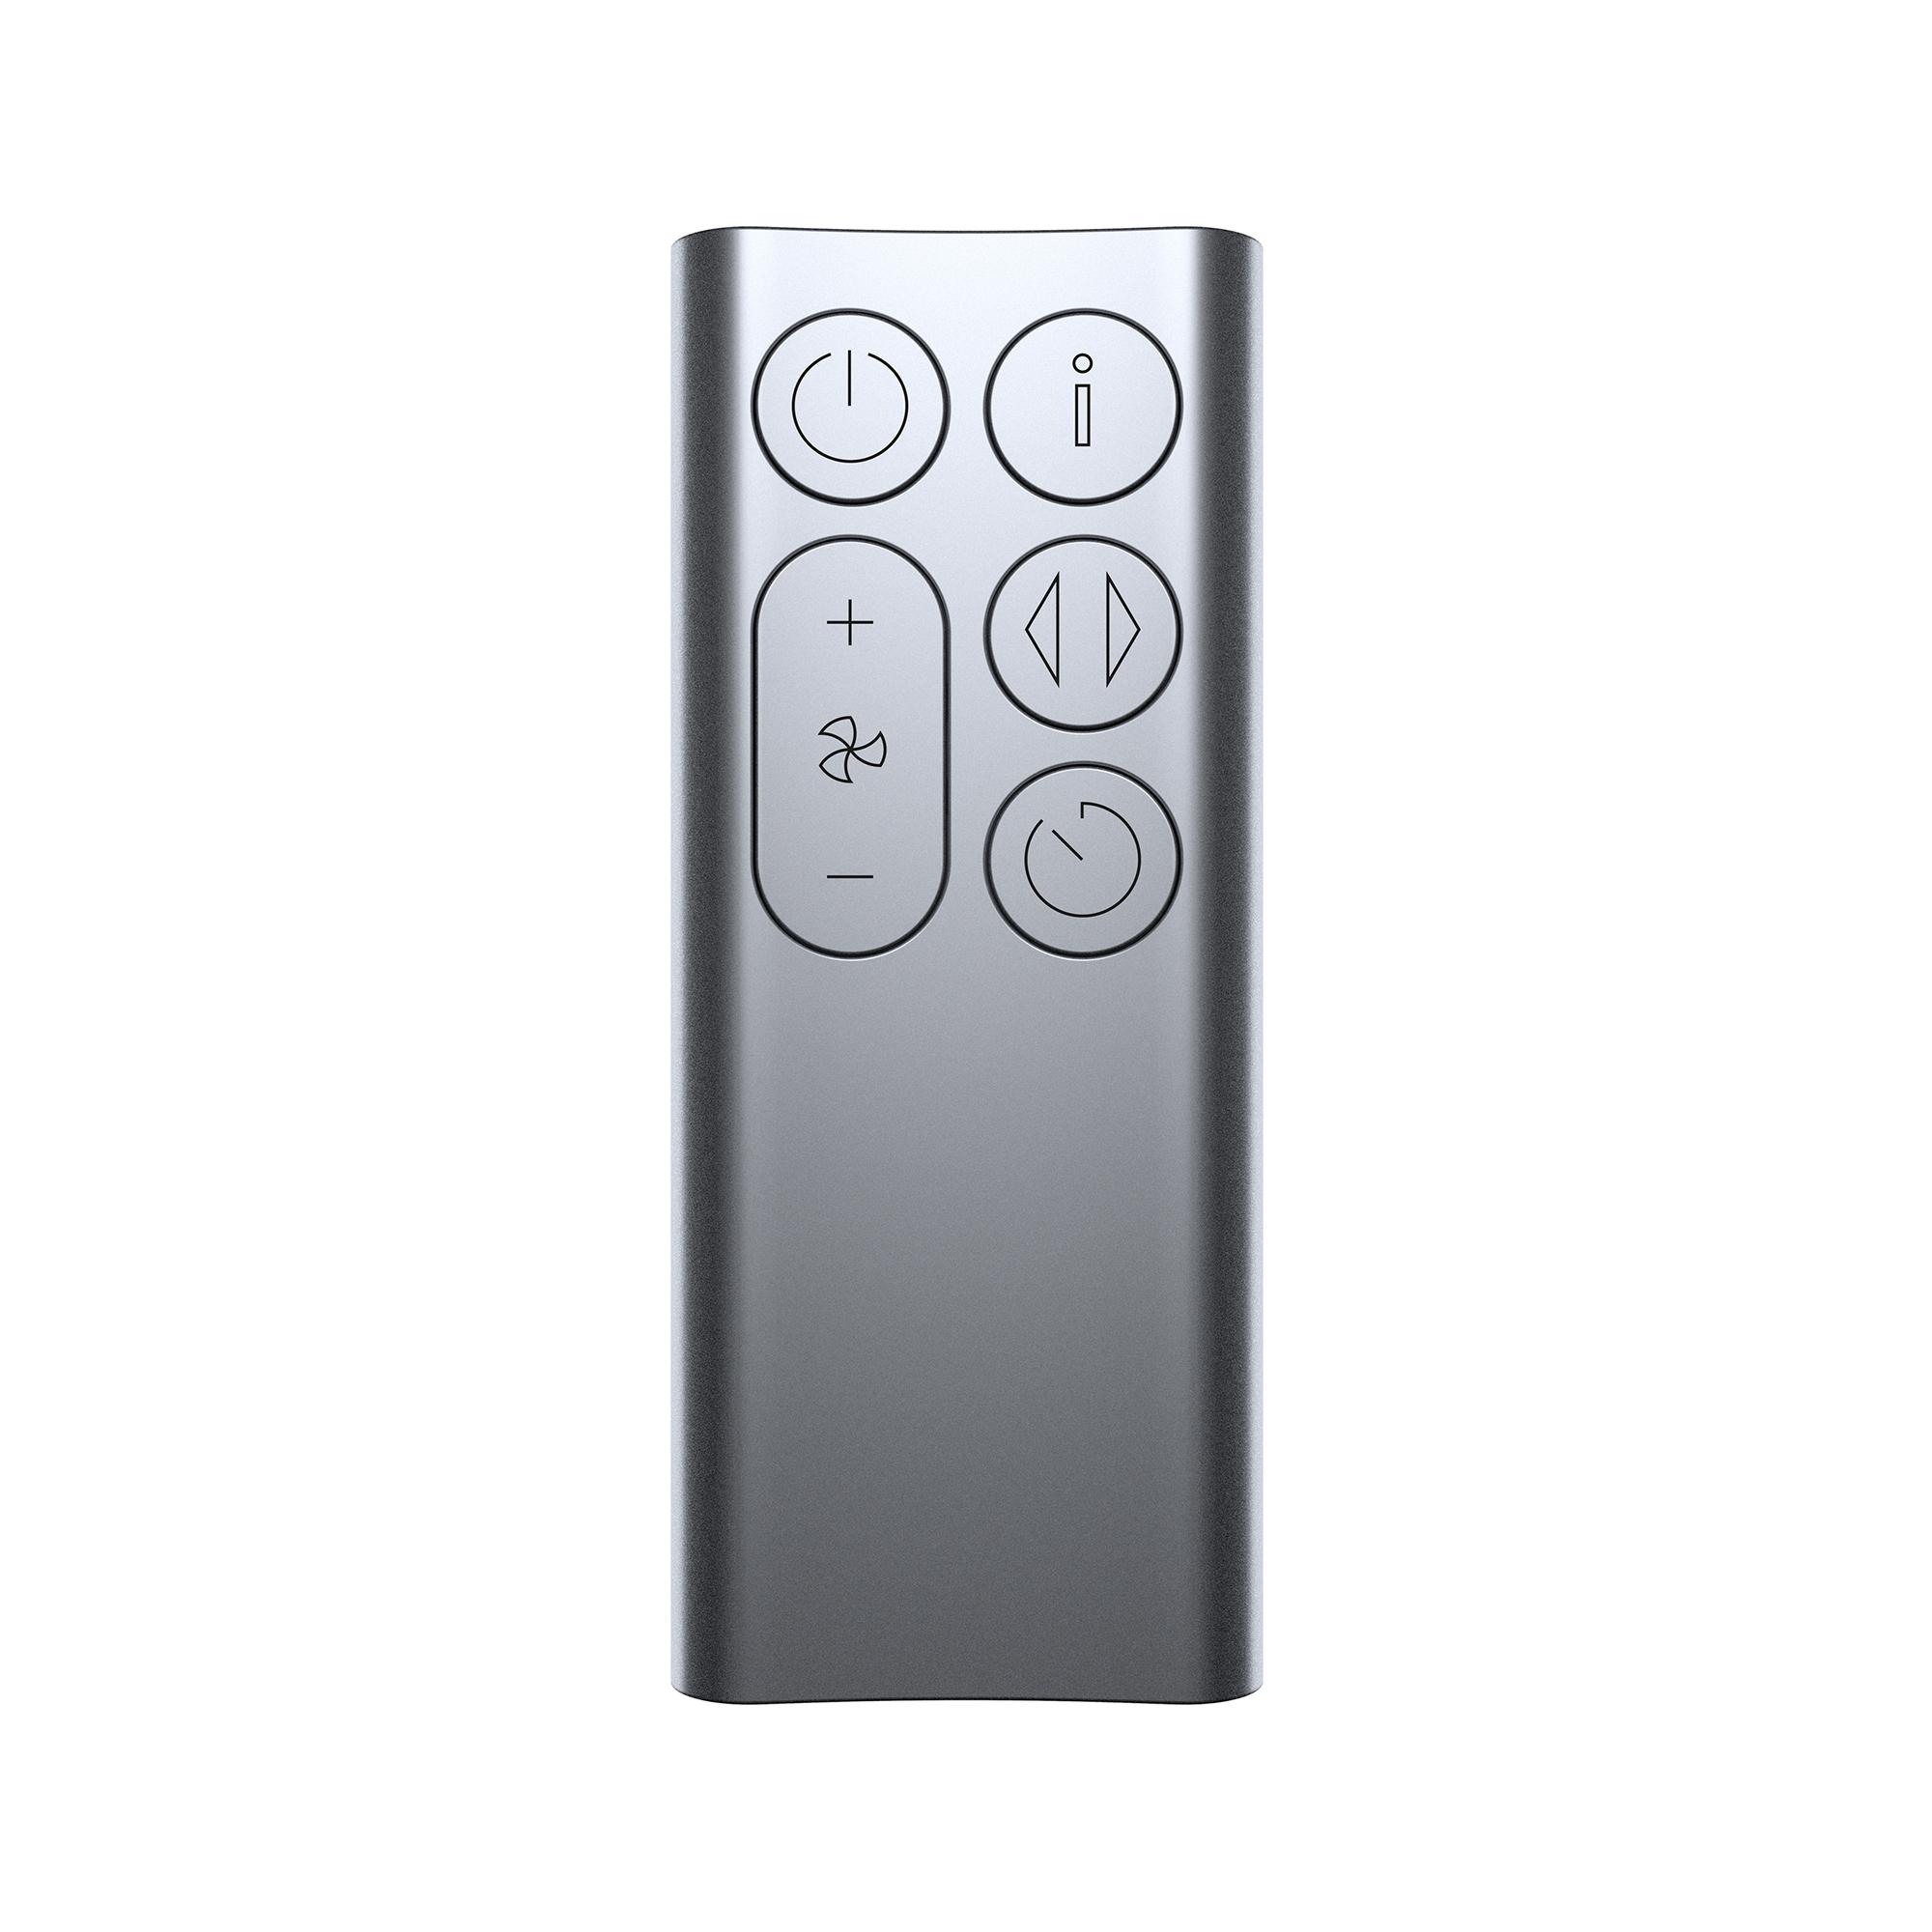 Dyson-BP01-Pure-Cool-Me-Personal-Air-Purifier-Fan-New thumbnail 31